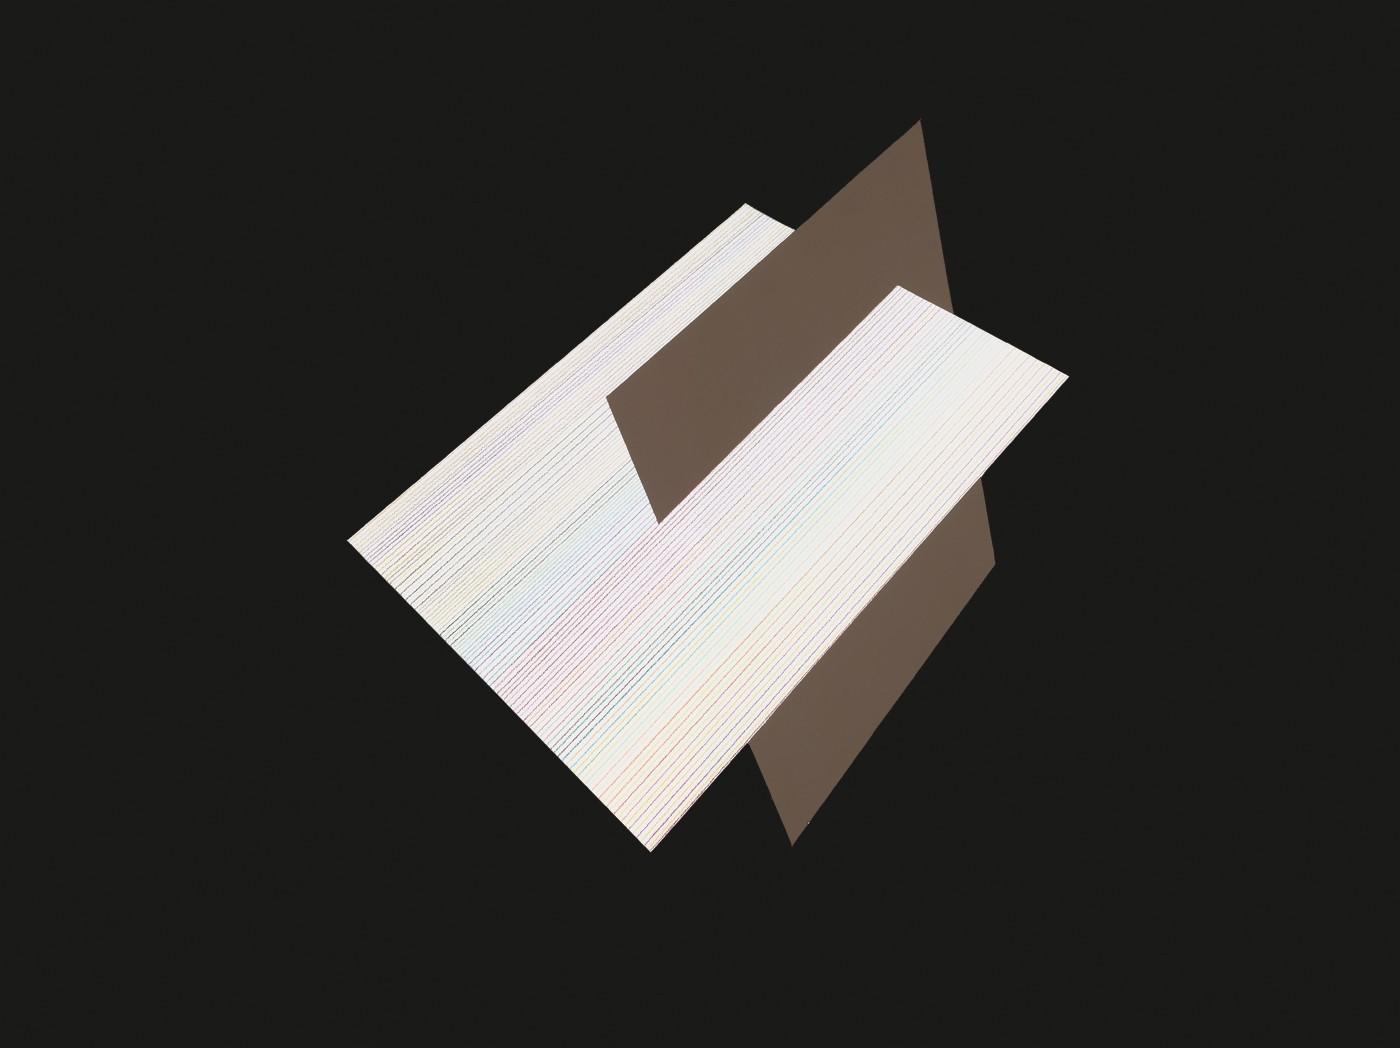 Jovanovics Tamás: 430×330